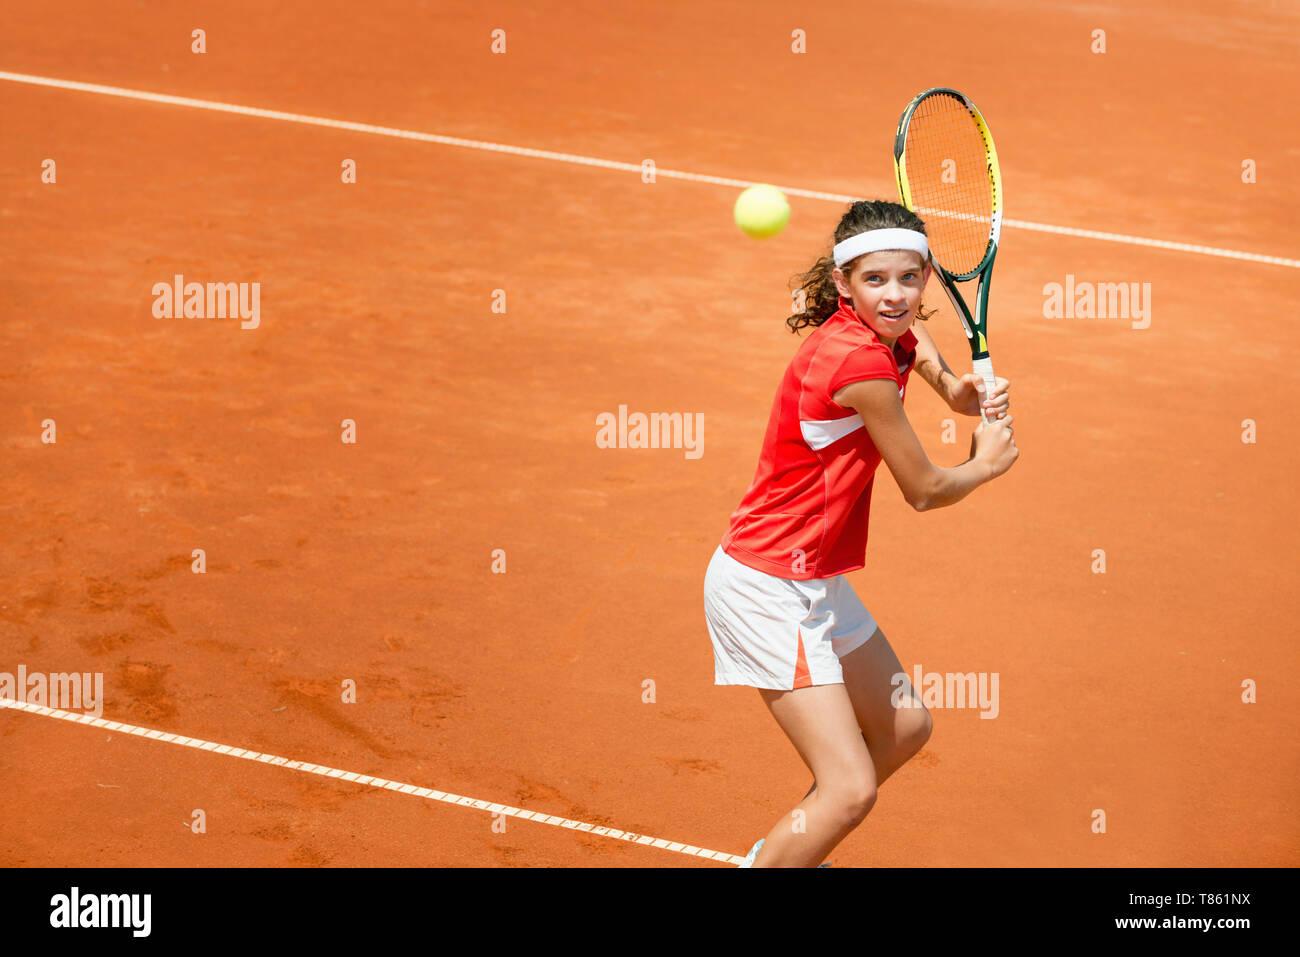 Girl playing tennis - Stock Image